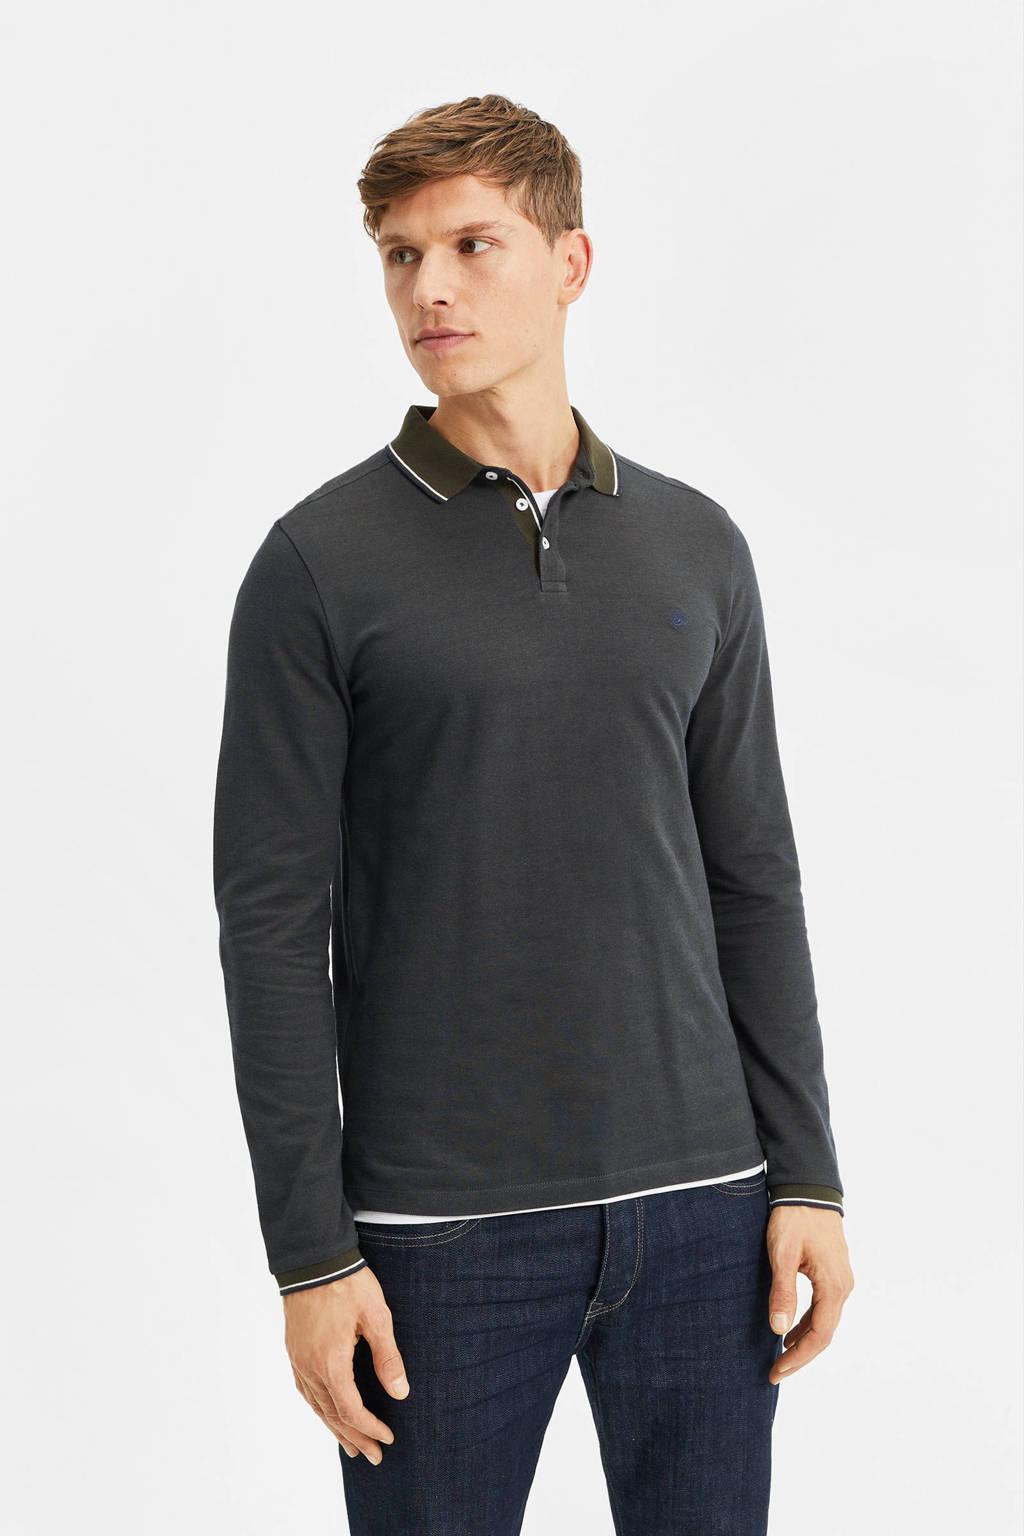 WE Fashion slim fit polo met contrastbies donkergroen/donkerblauw, Donkergroen/donkerblauw